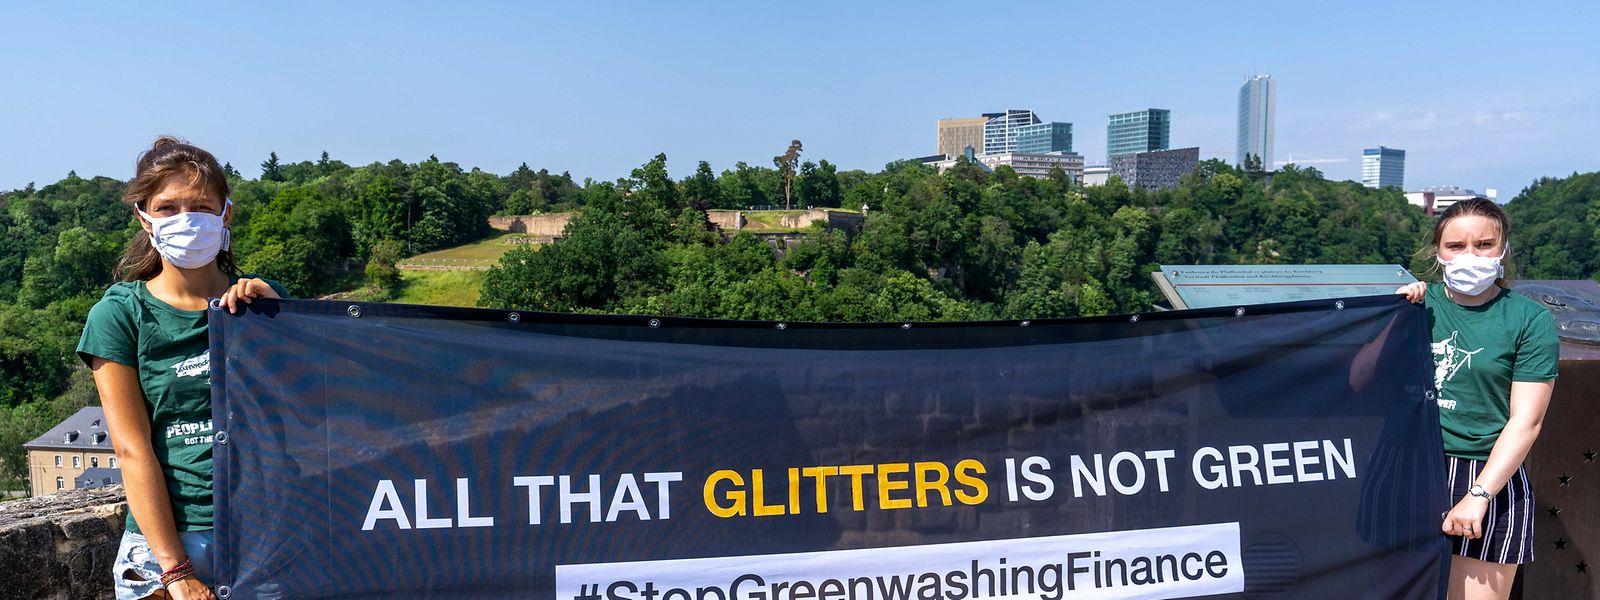 Luxemburg rangiert im Global Green Finance Index unter den führenden grünen Finanzzentren der Welt. Greenpeace fordert, genauer hinzuschauen.